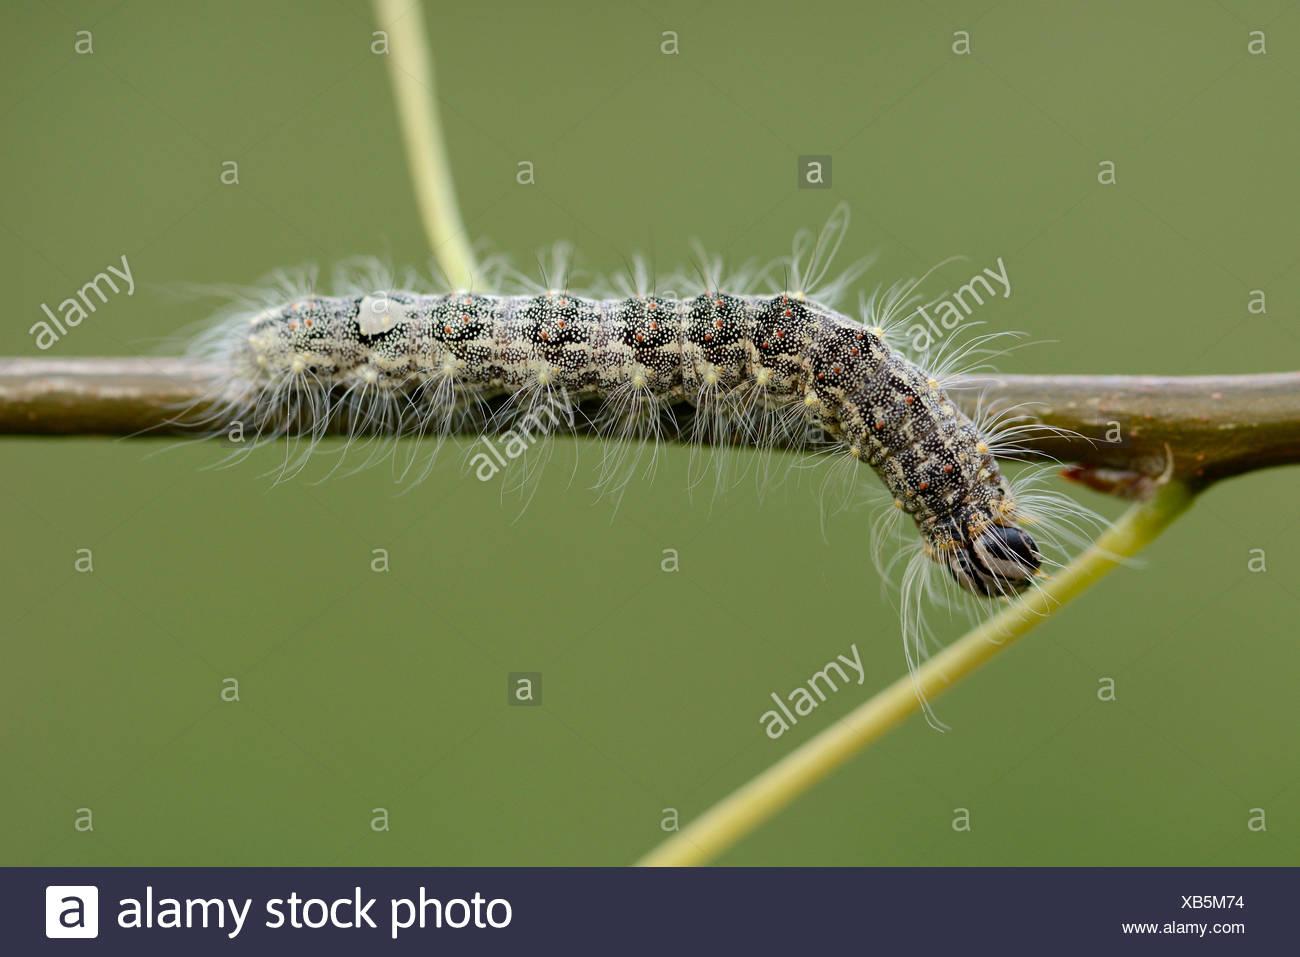 Caterpillar of Poplar Grey, Acronicta megacephala, on a twig - Stock Image